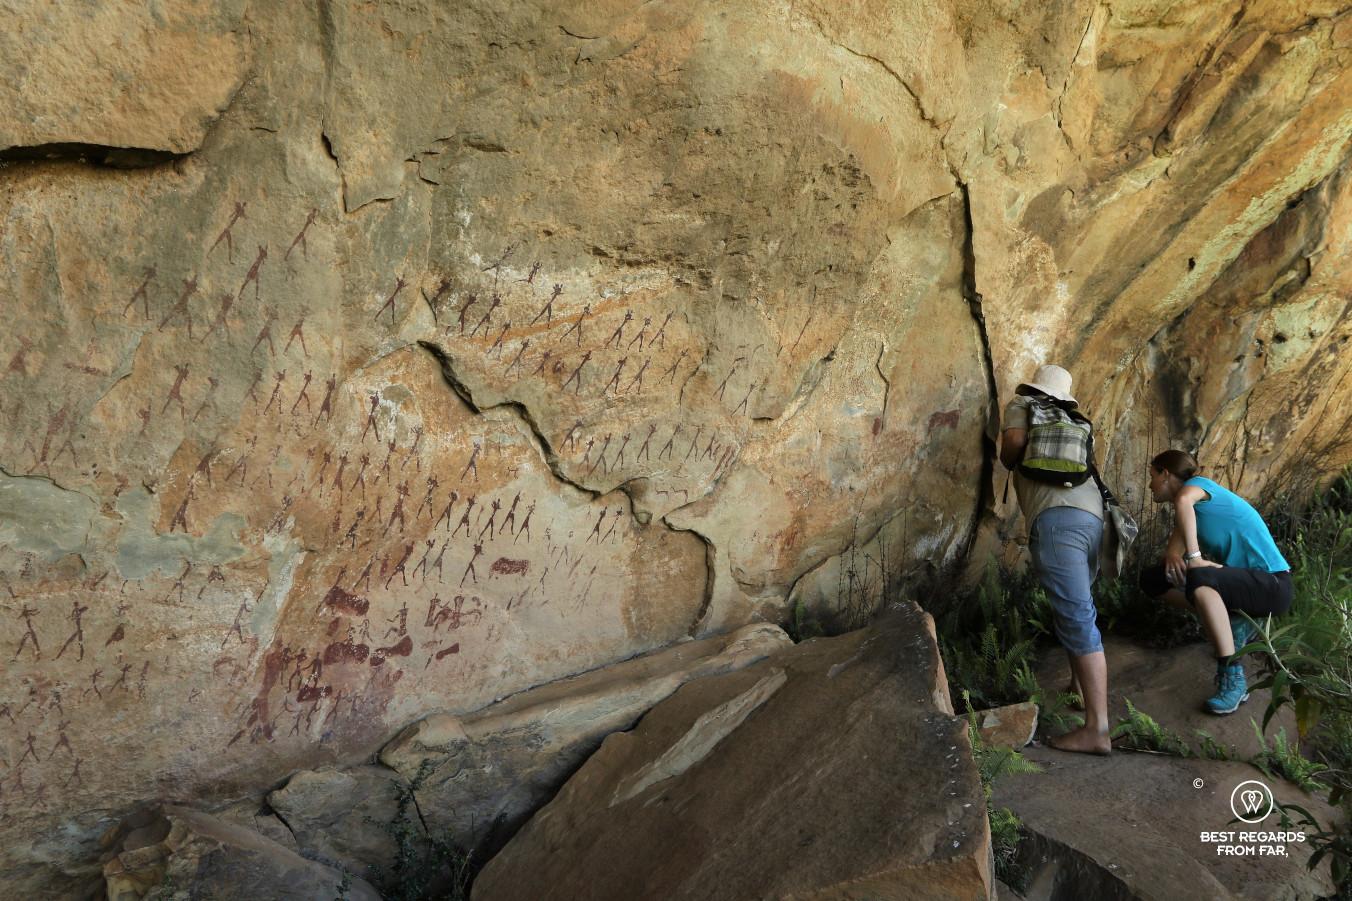 Hikers studying Bushmen rock art in the Drakensberg, South Africa.